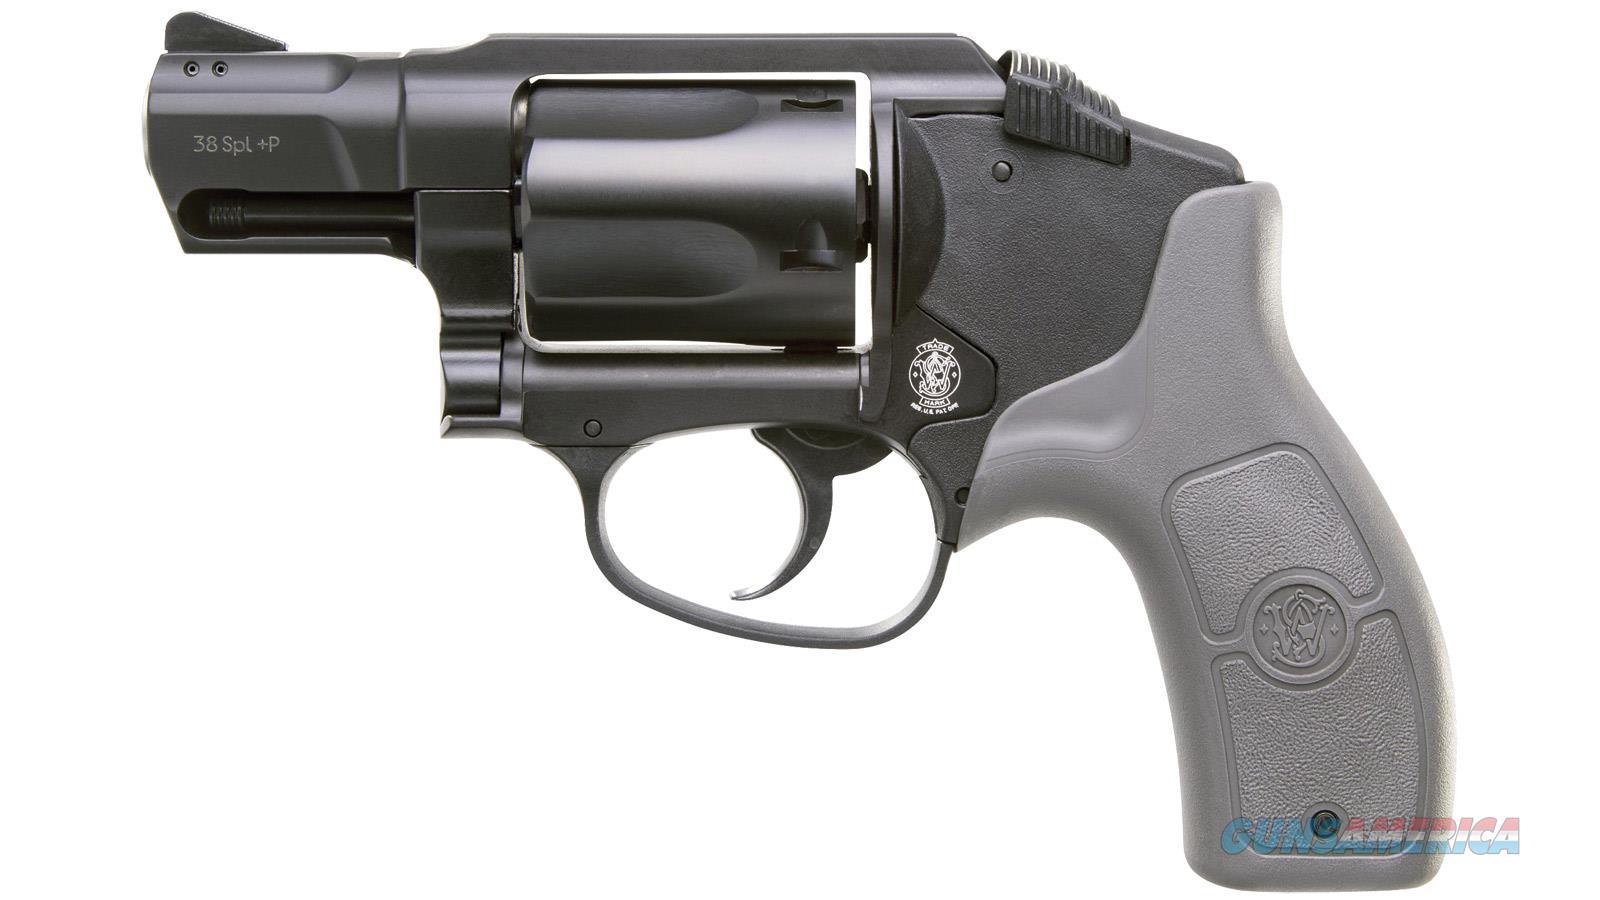 Smith & Wesson Bodyguard 38SPL Revolver - No Laser  Guns > Pistols > Smith & Wesson Revolvers > Small Frame ( J )